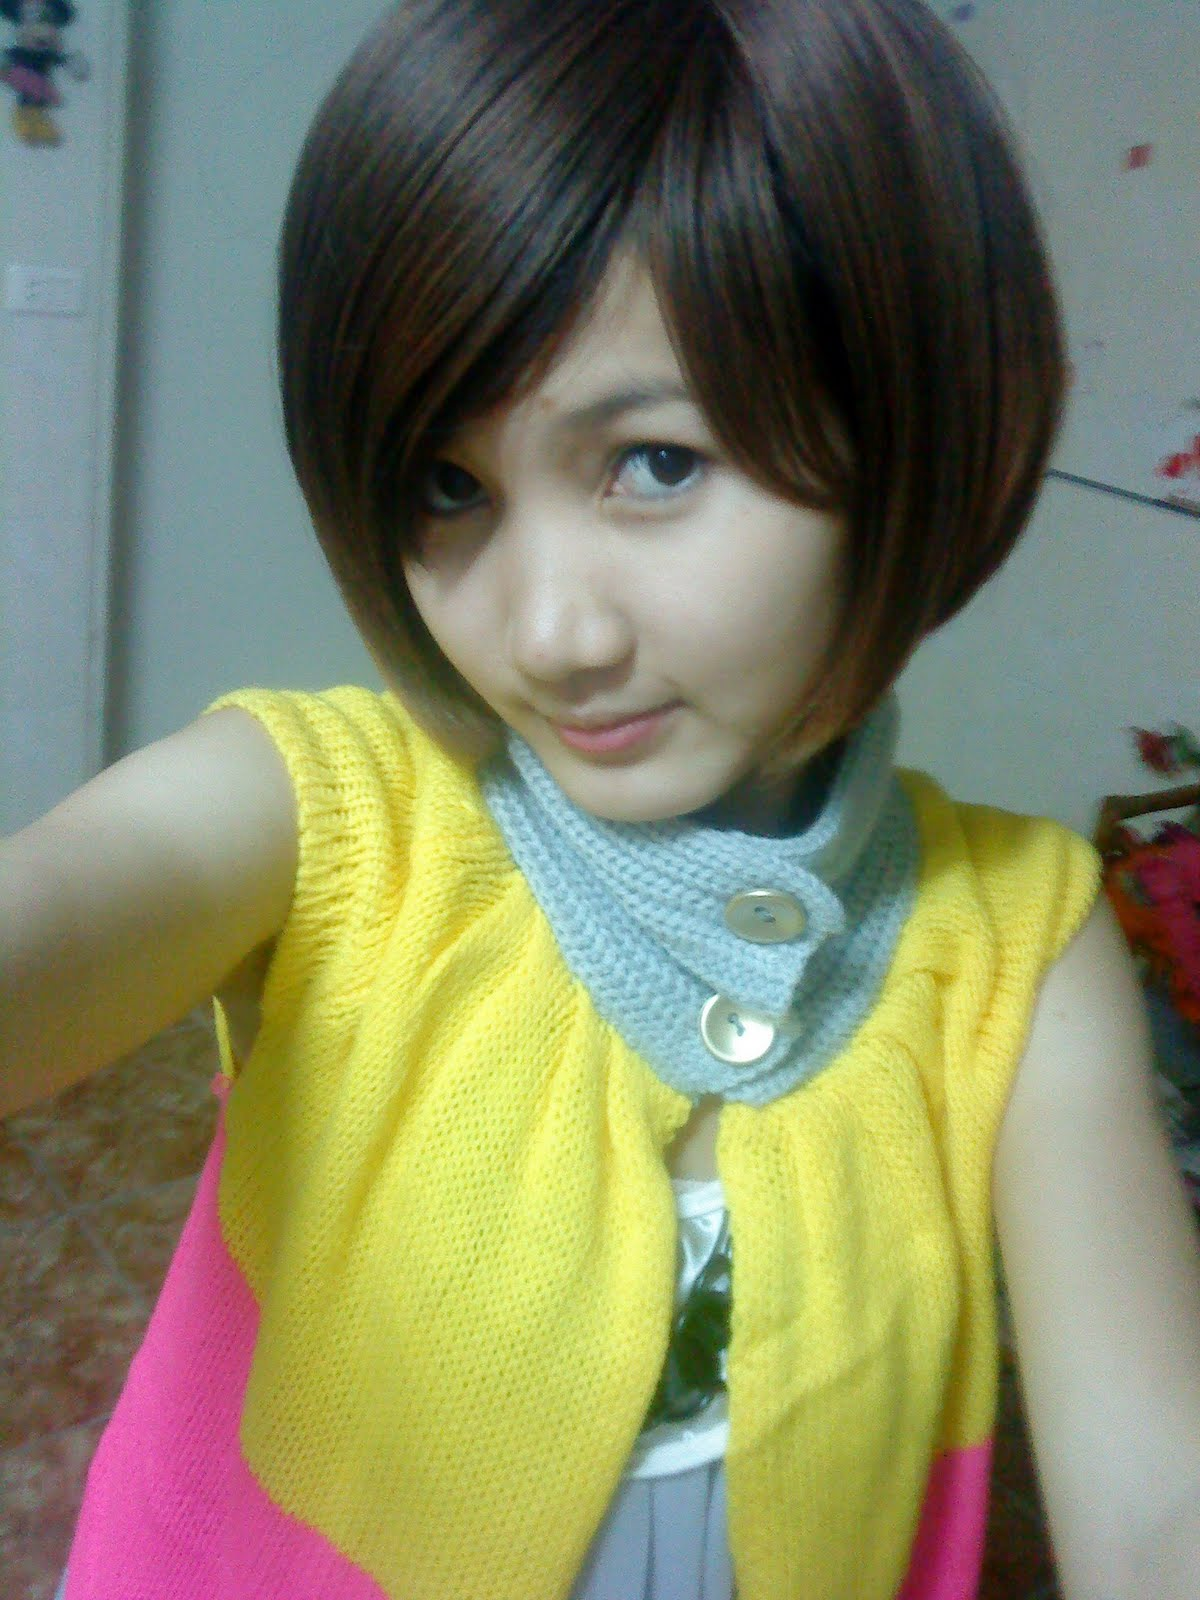 Pretty photo khmer girl